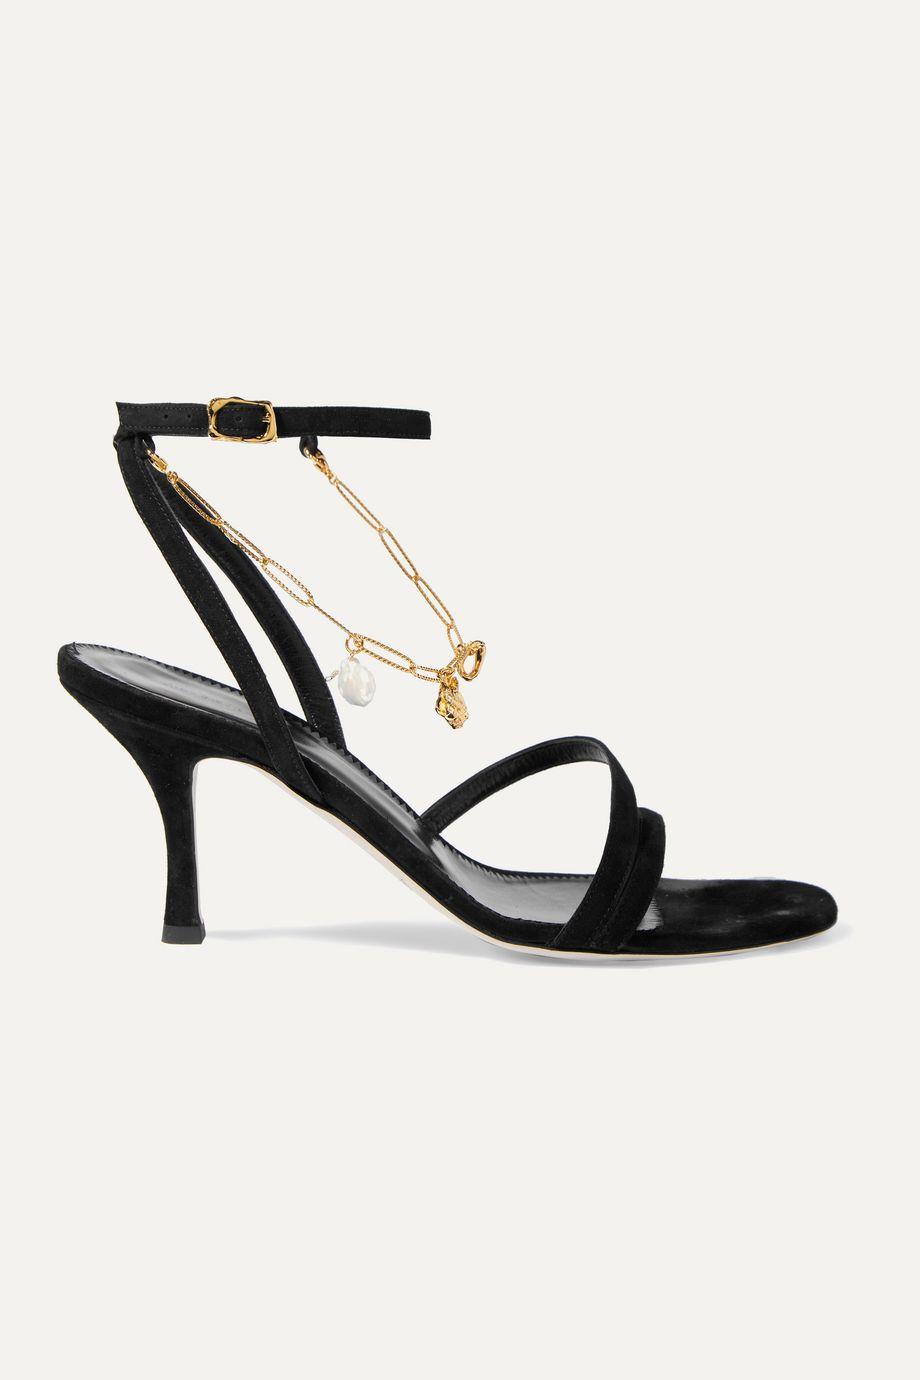 Alighieri The Wondering Traveller embellished suede sandals